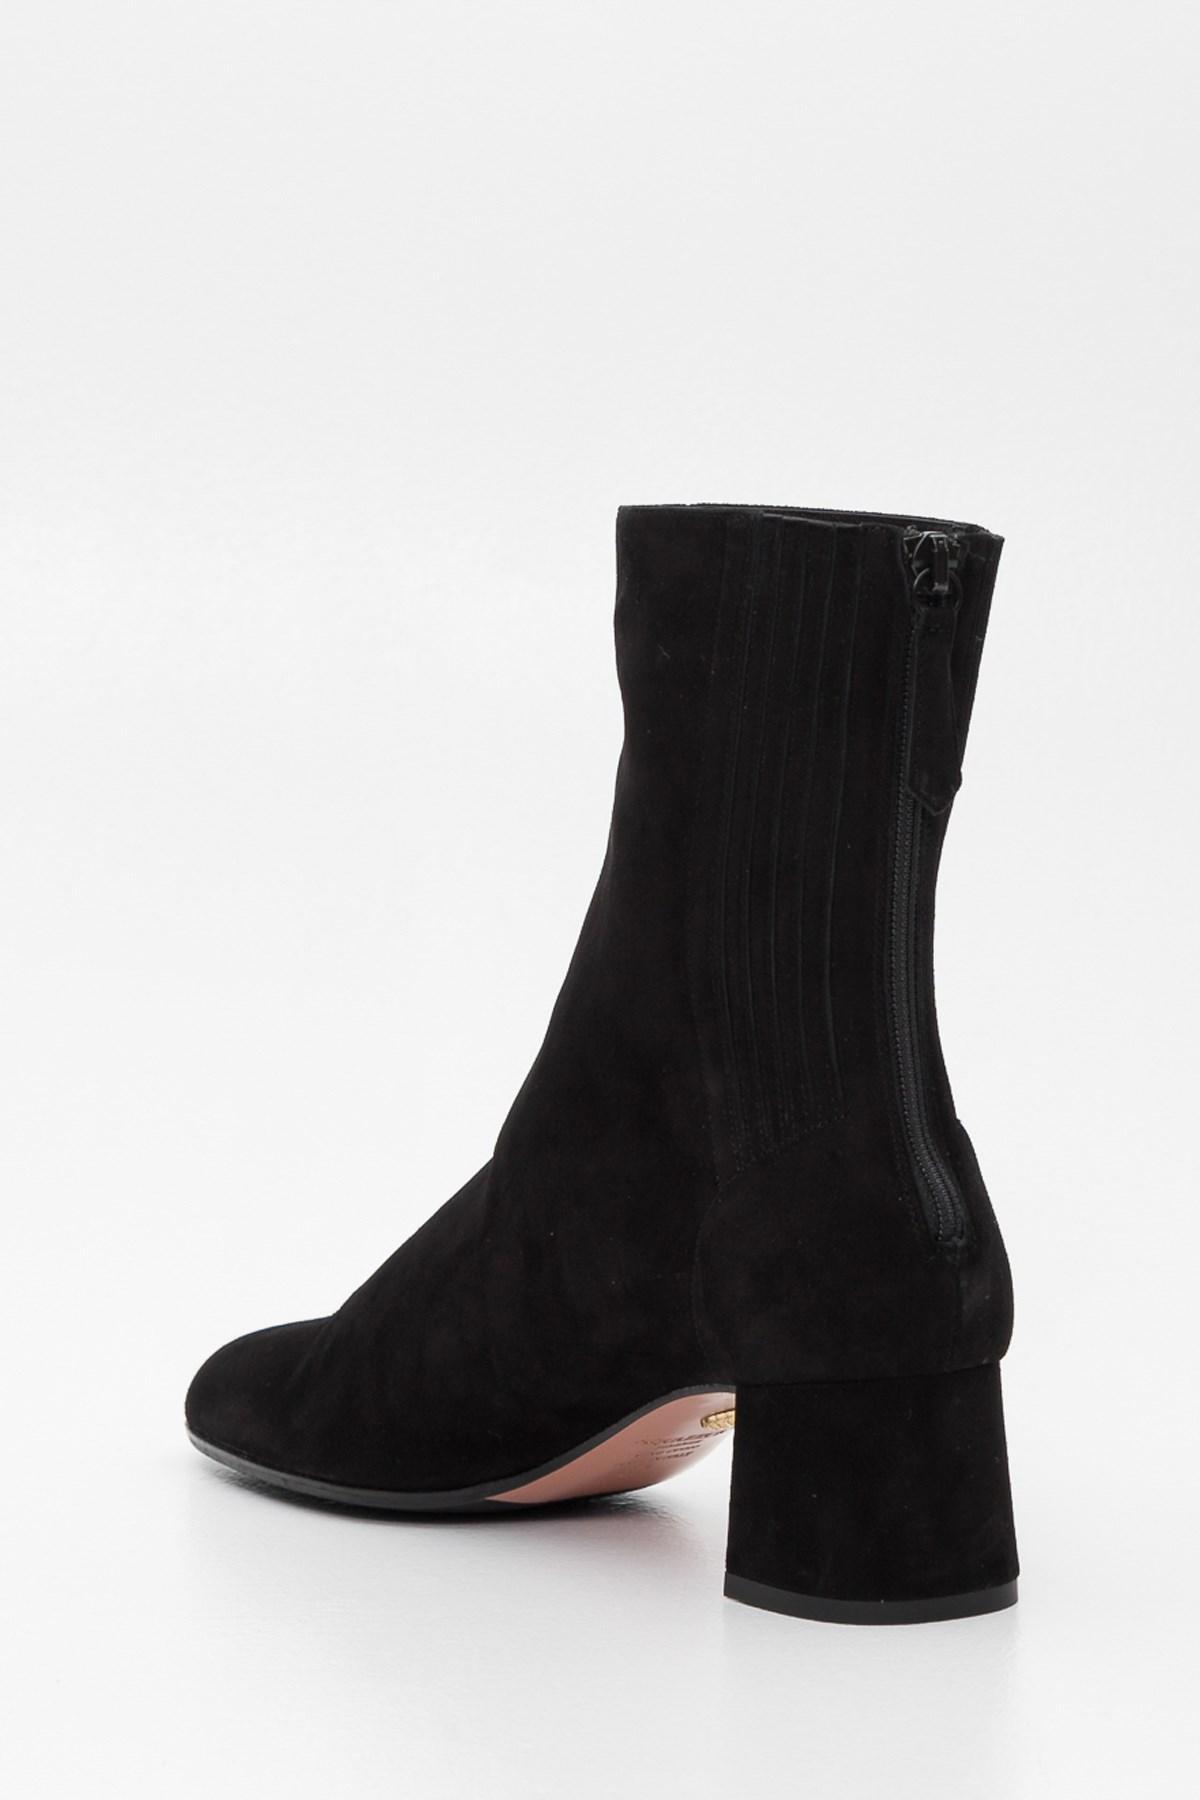 Aquazzura Suede Mid-calf Block Heel Boots in Black - Save 50%